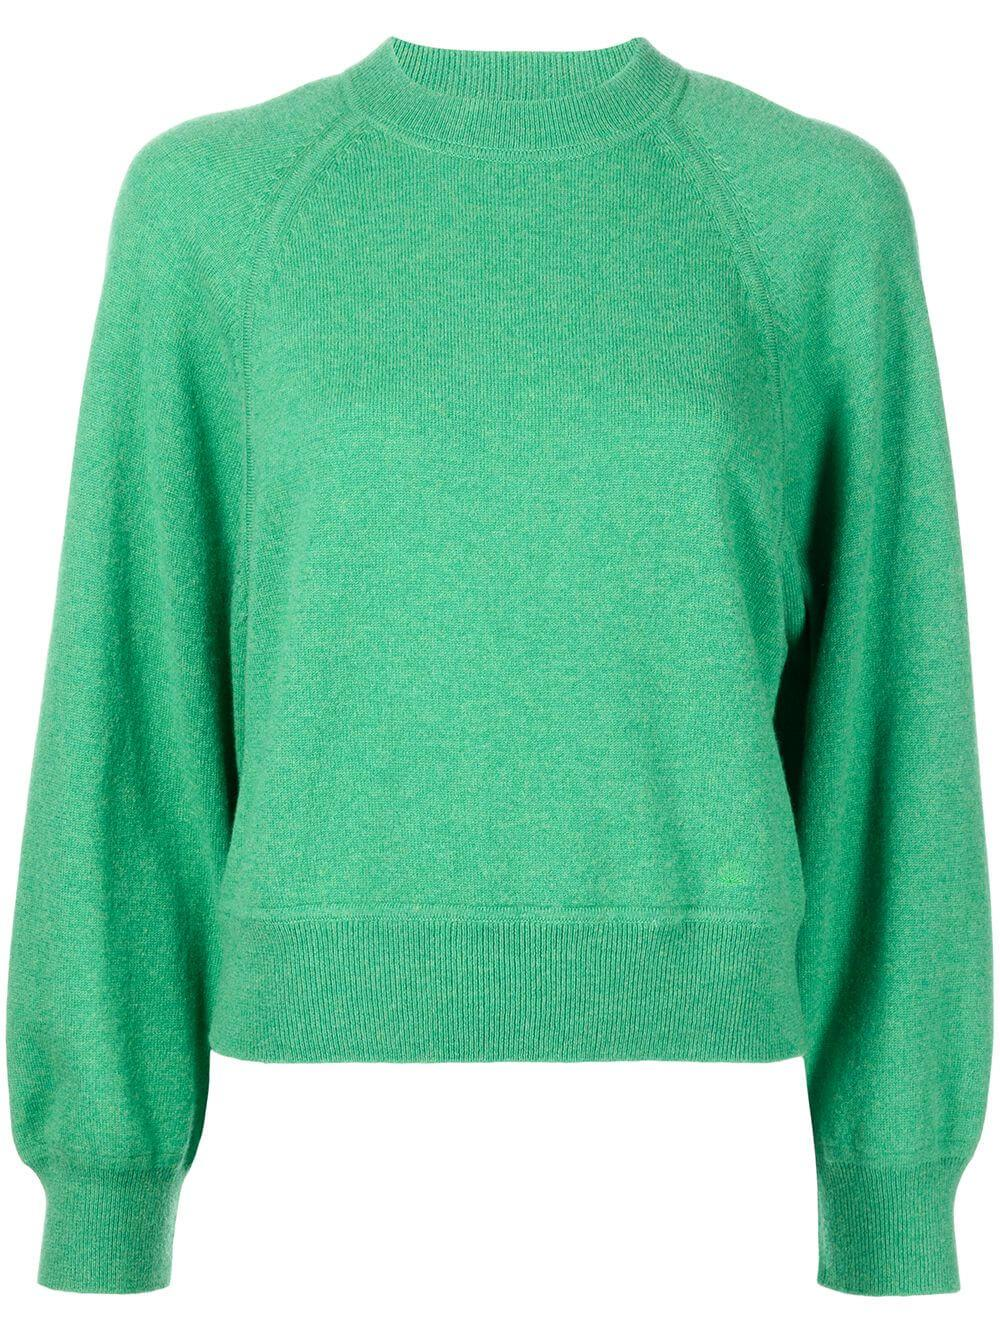 Pemba Cashmere Sweater Item # PEMBA